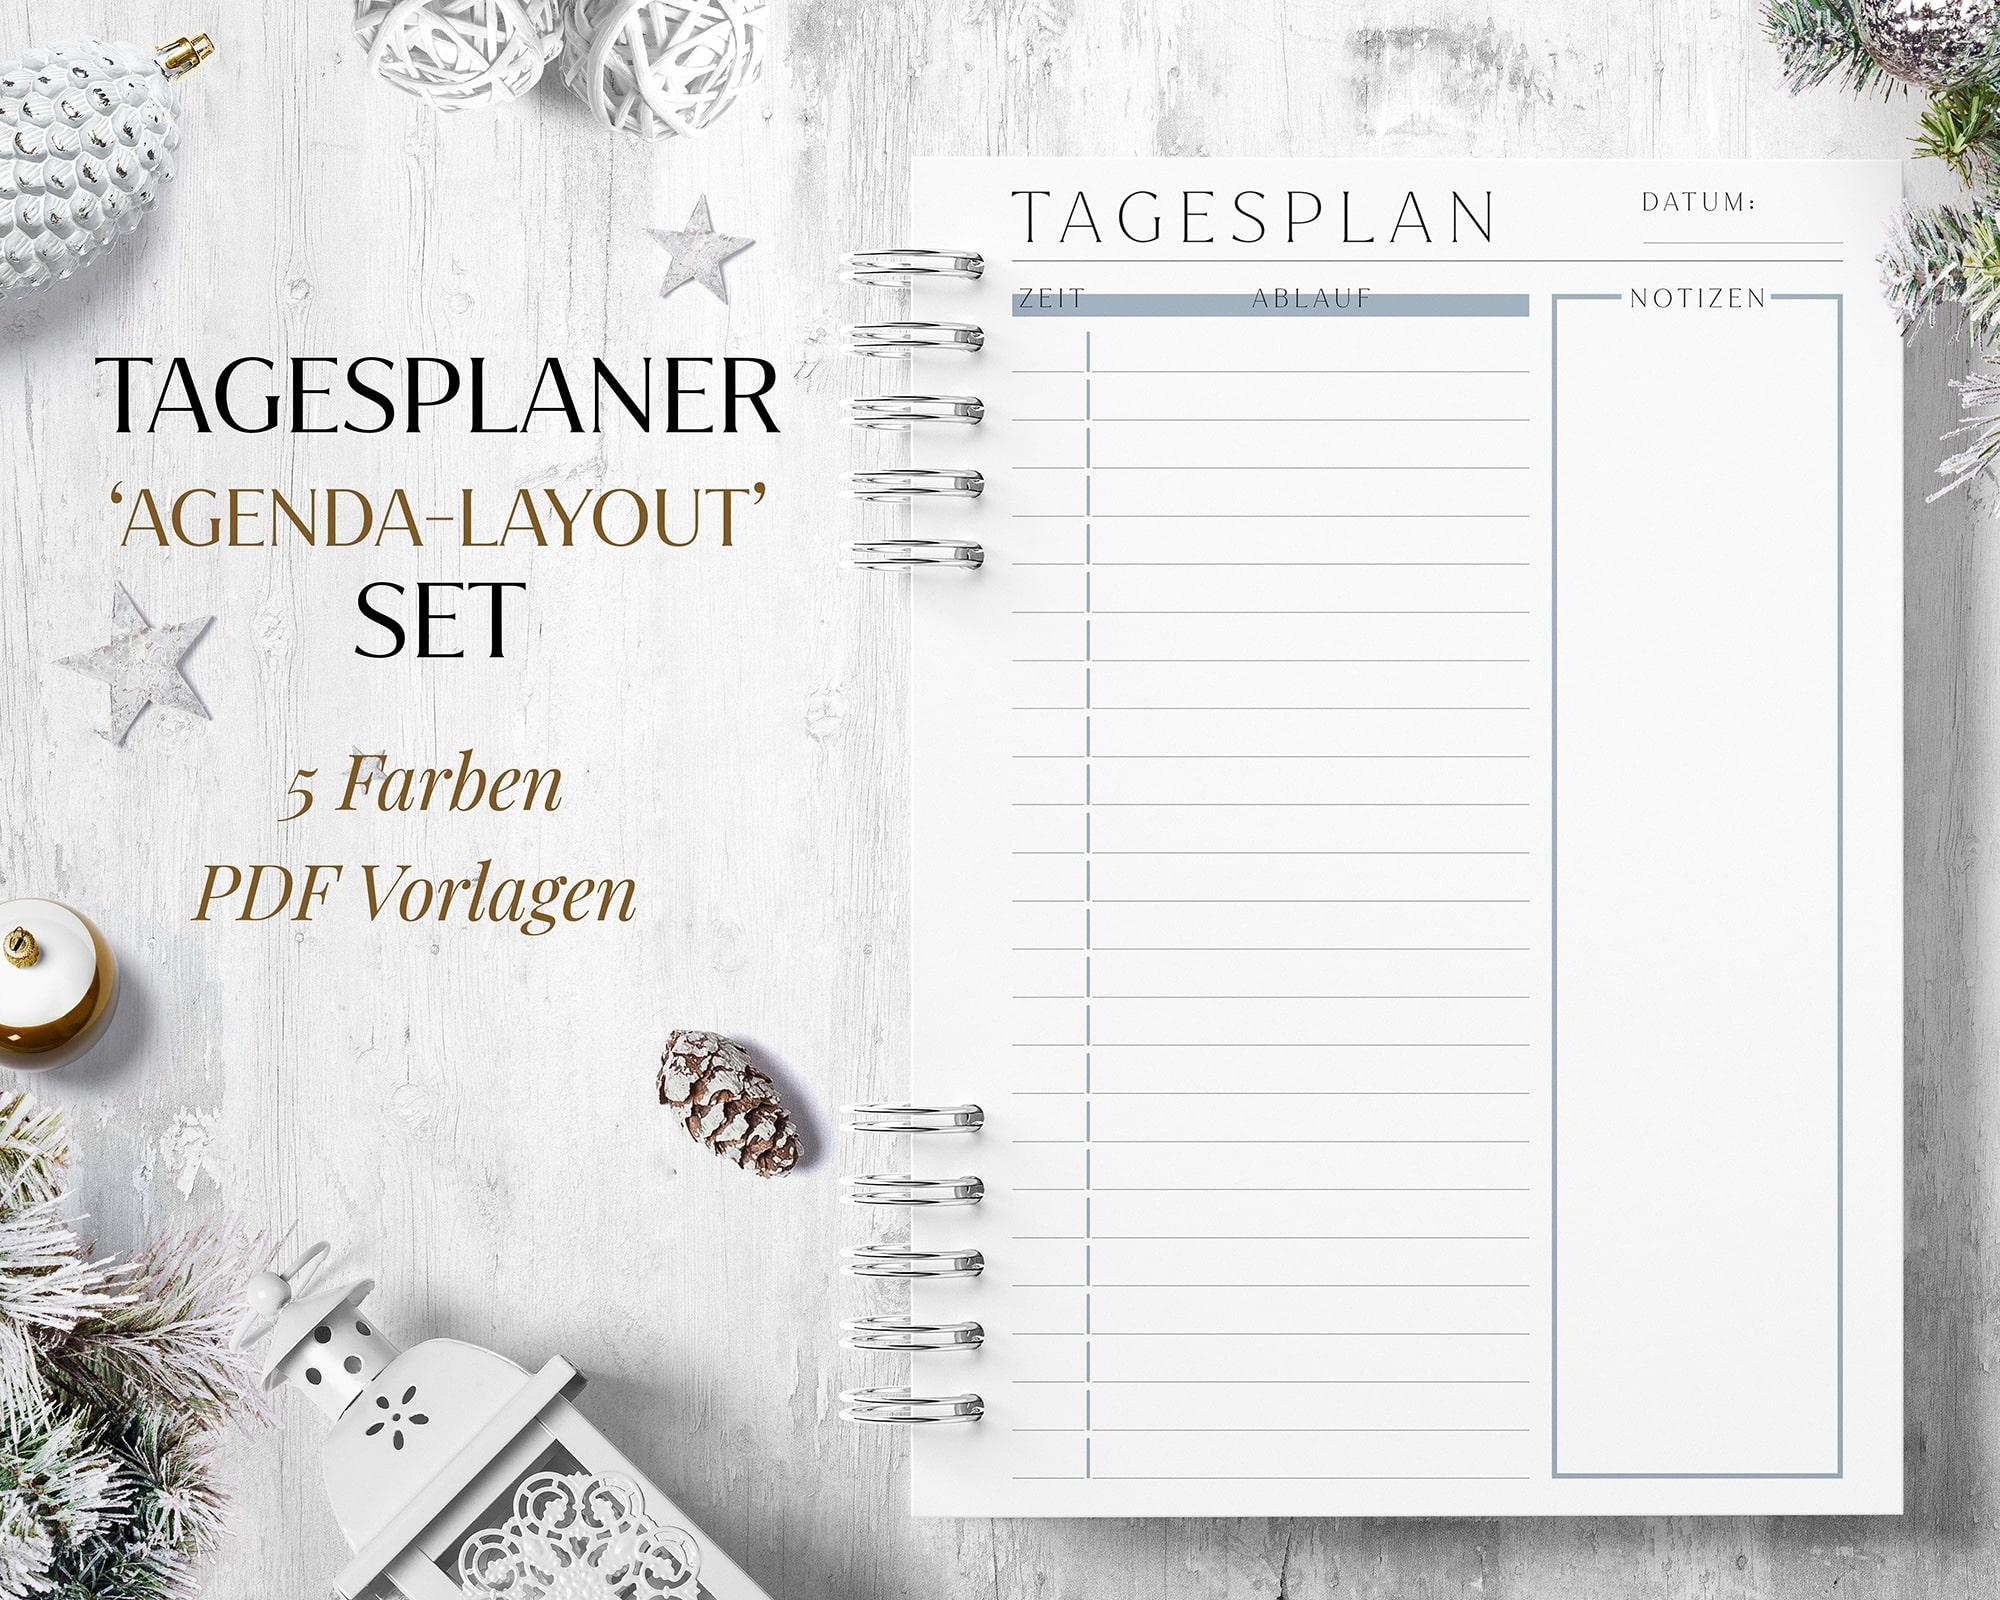 Tagesplaner Agenda Style Zeitplan